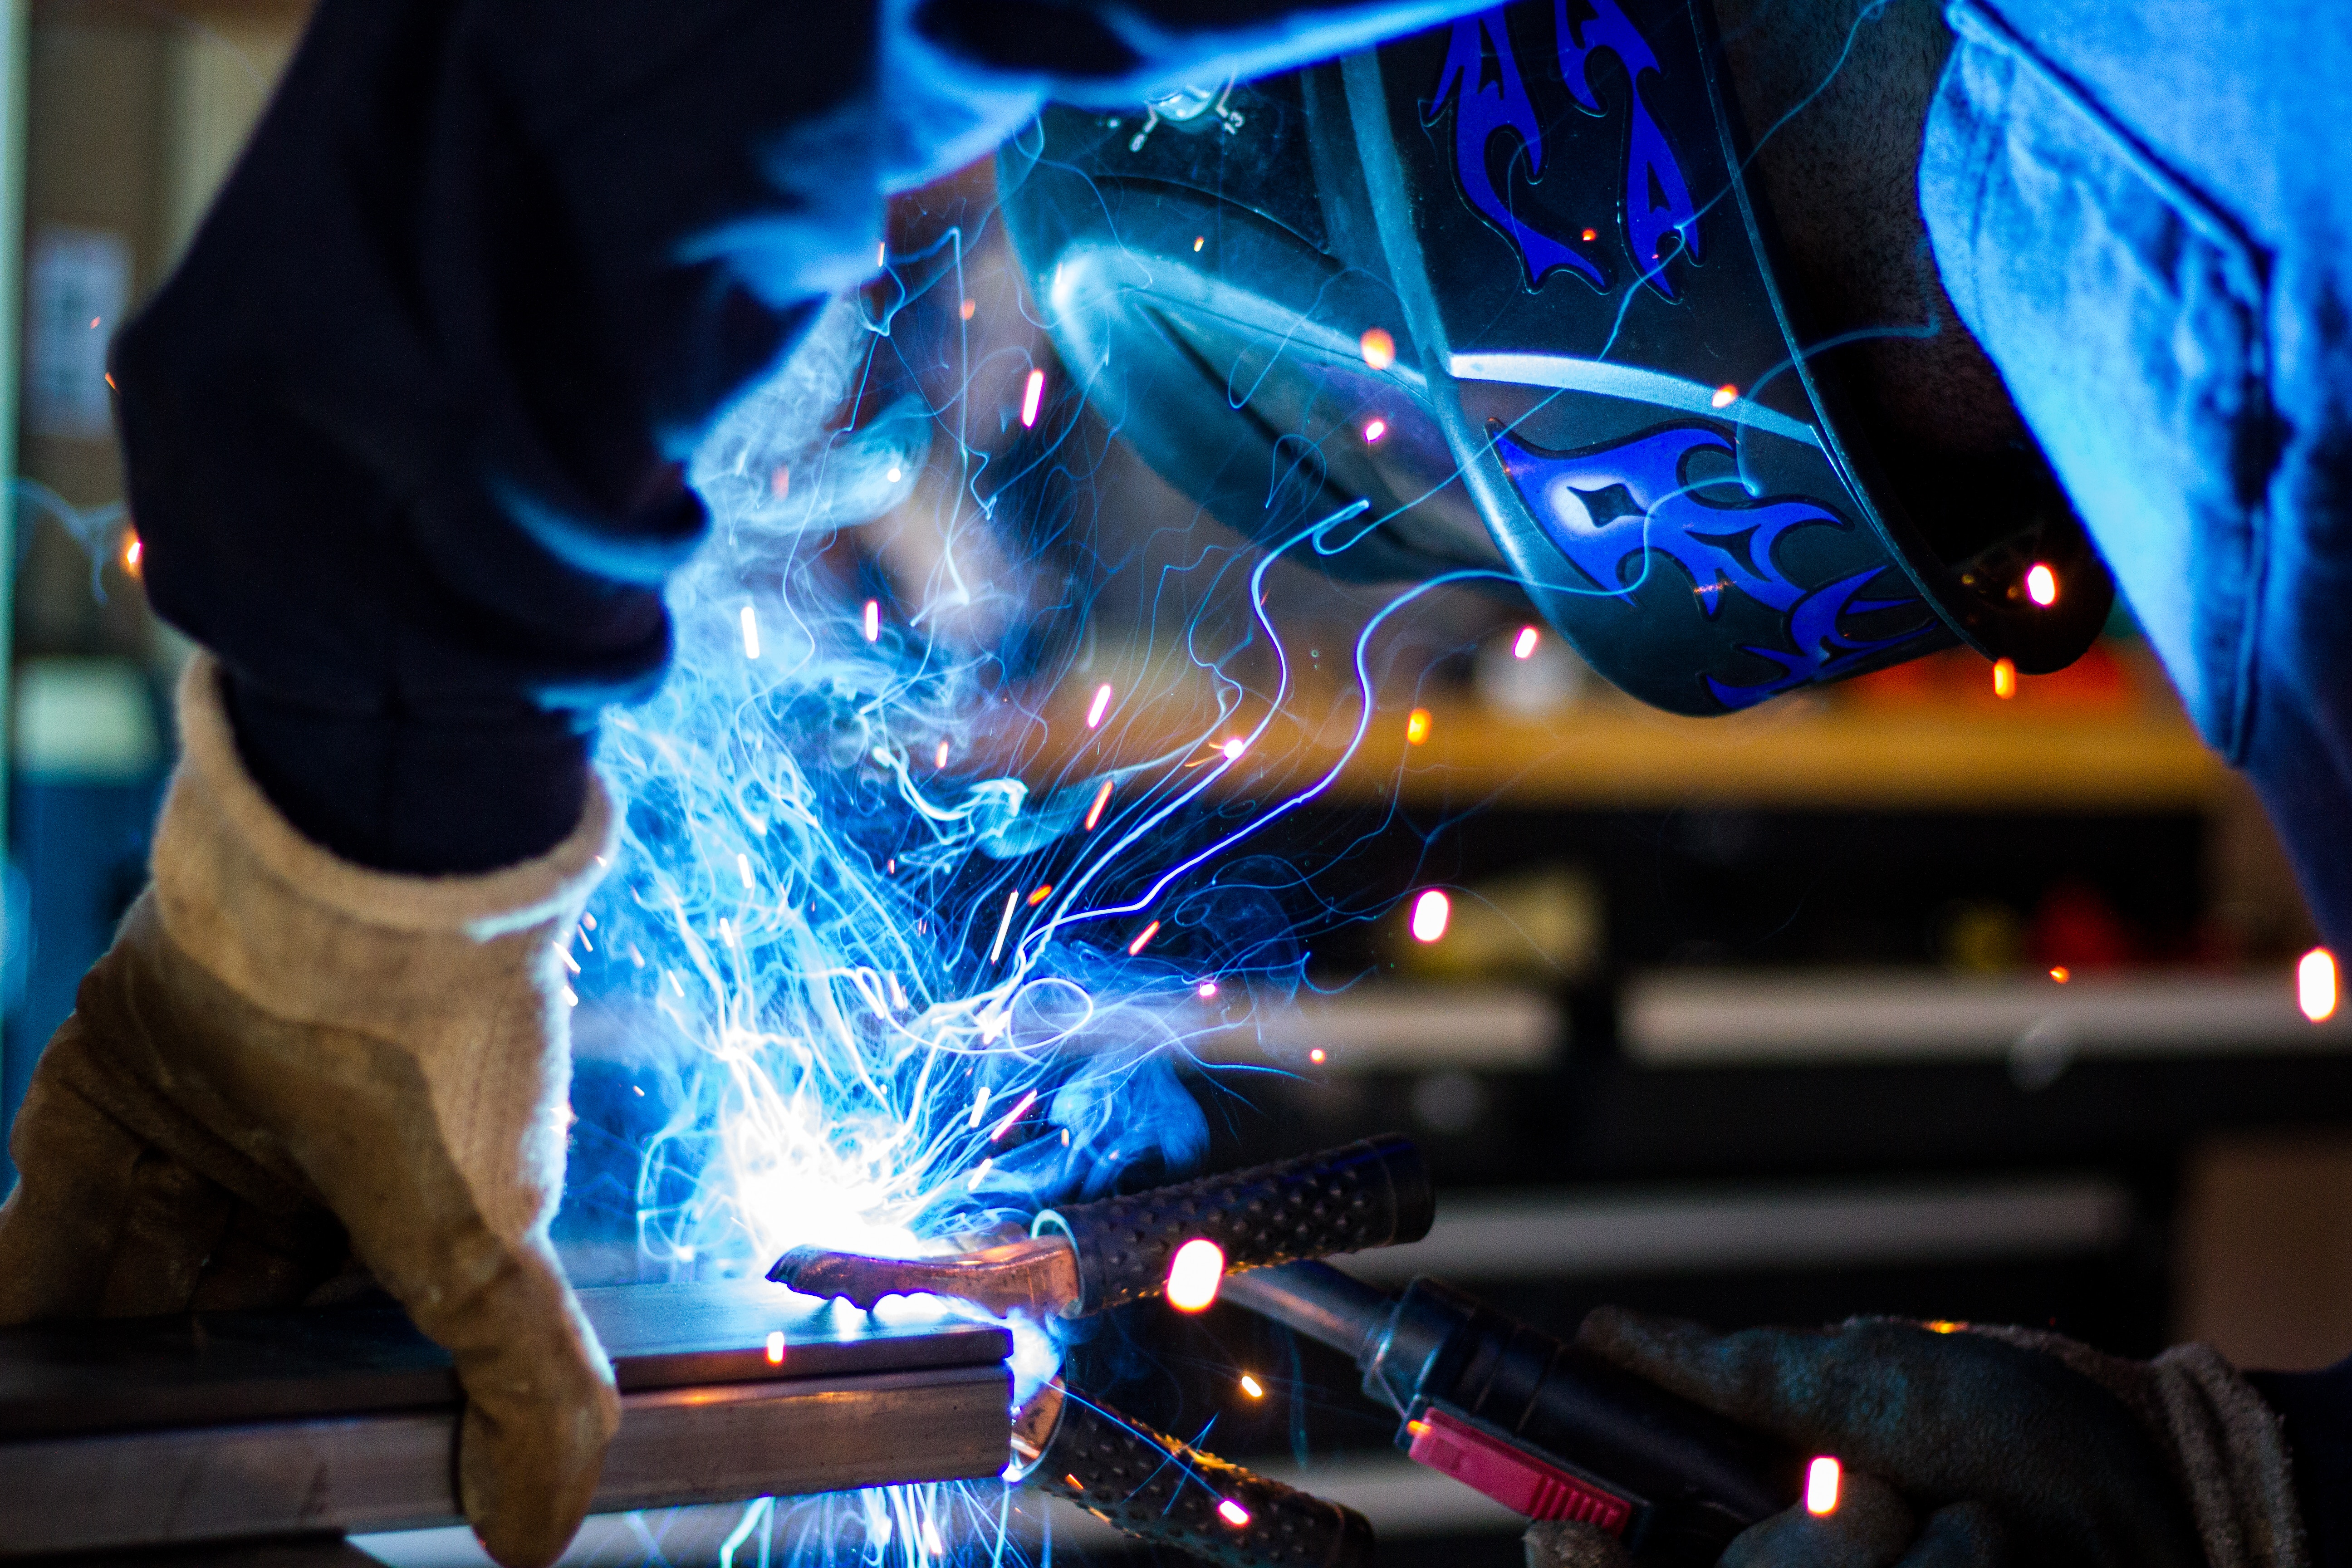 Manufacturing employee working